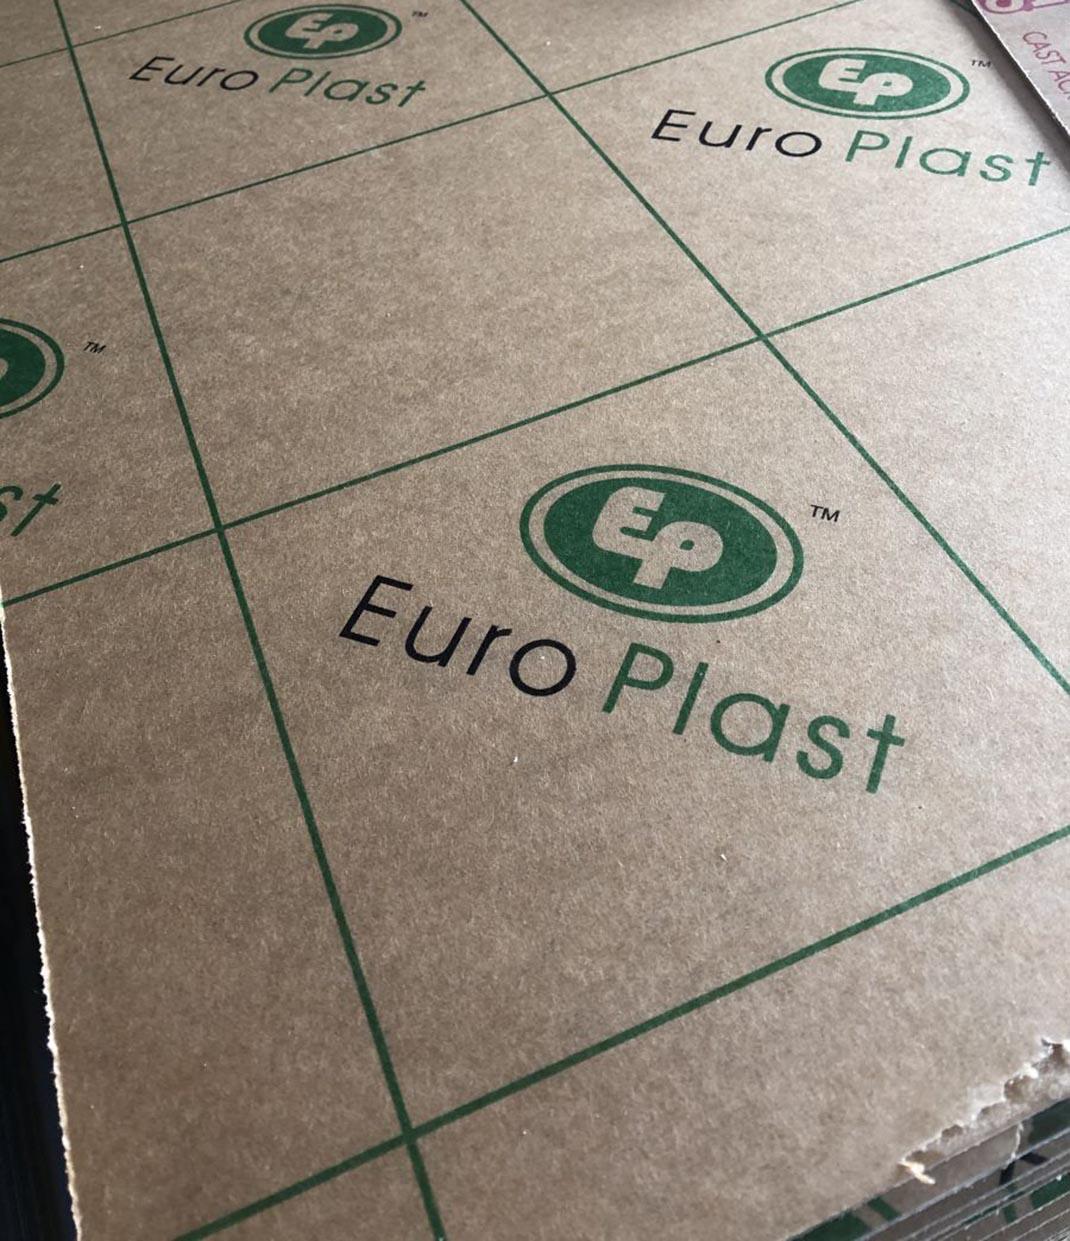 Tấm mica Ấn Độ Euro Plast